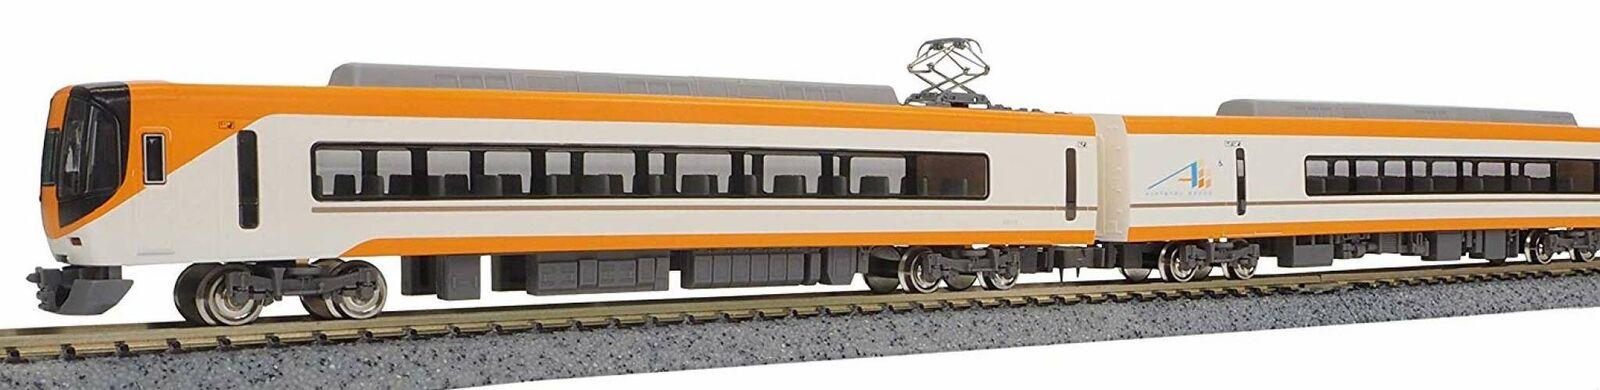 Greenmax N gauge Kintetsu 22000 series ACE renewal car with power 30756